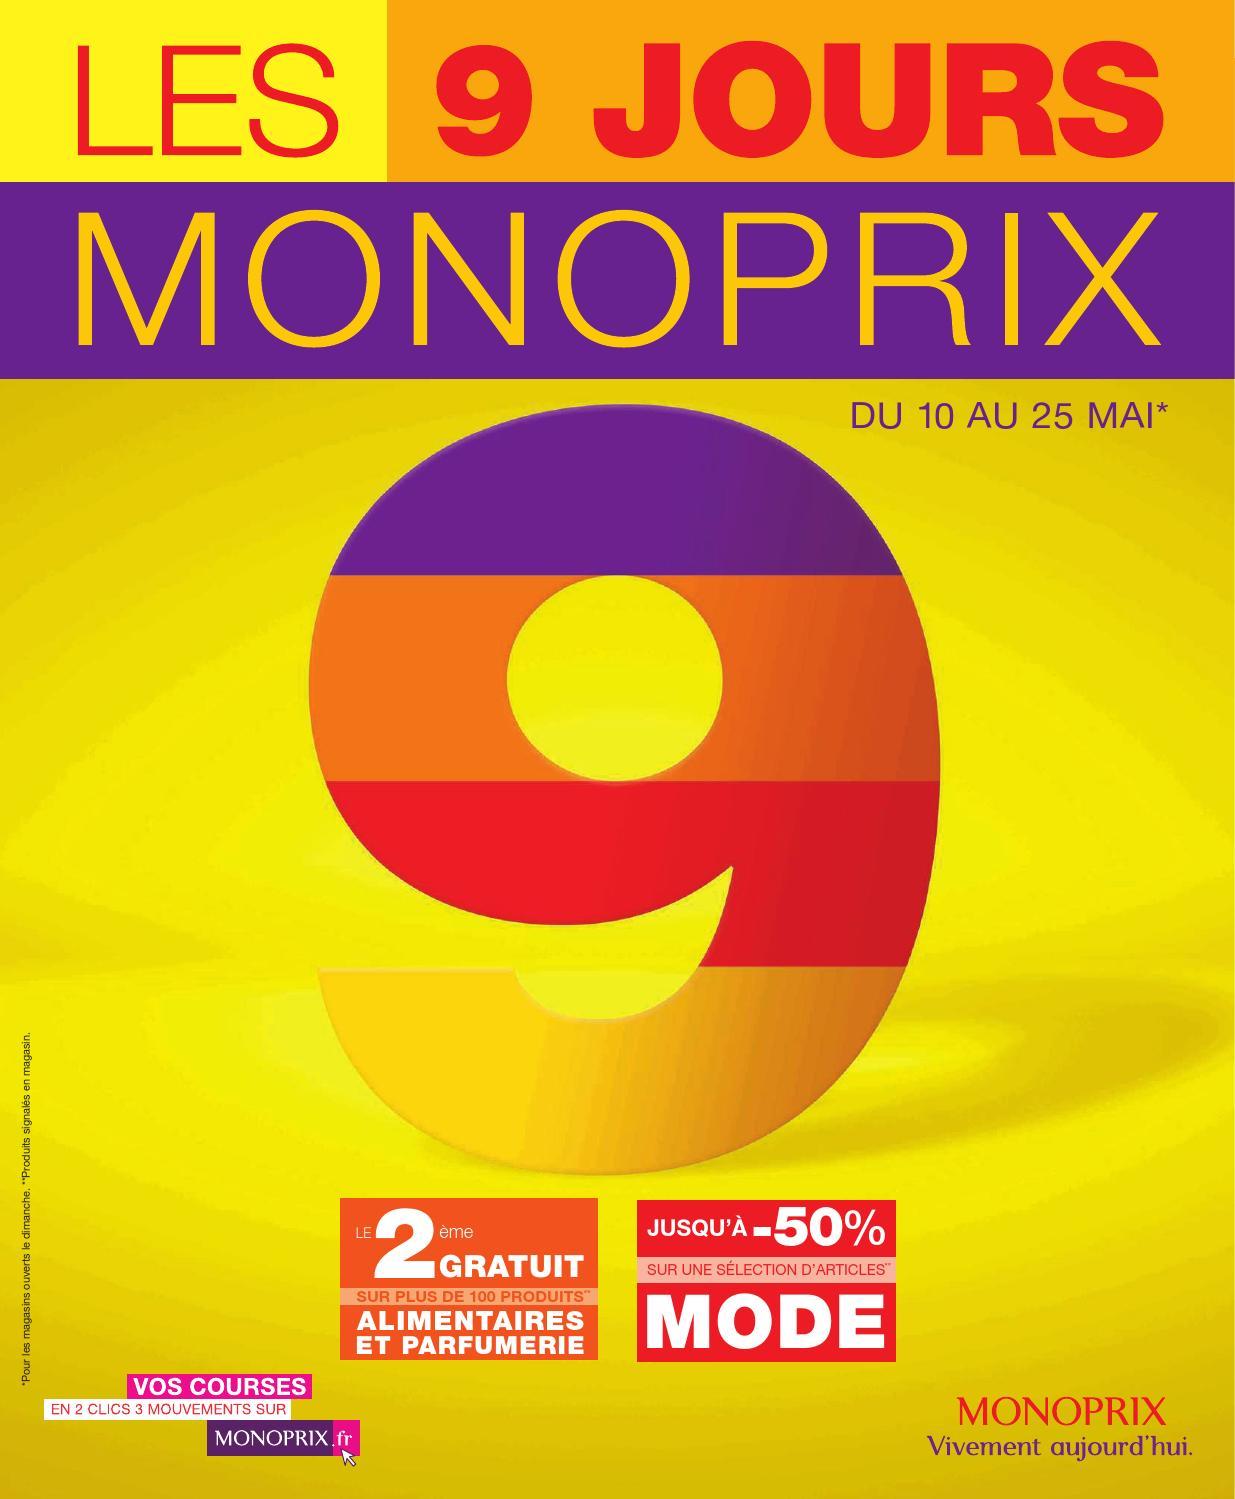 Catalogue monoprix du 10 au 25 mai by anti issuu - Monoprix 9 jours catalogue ...